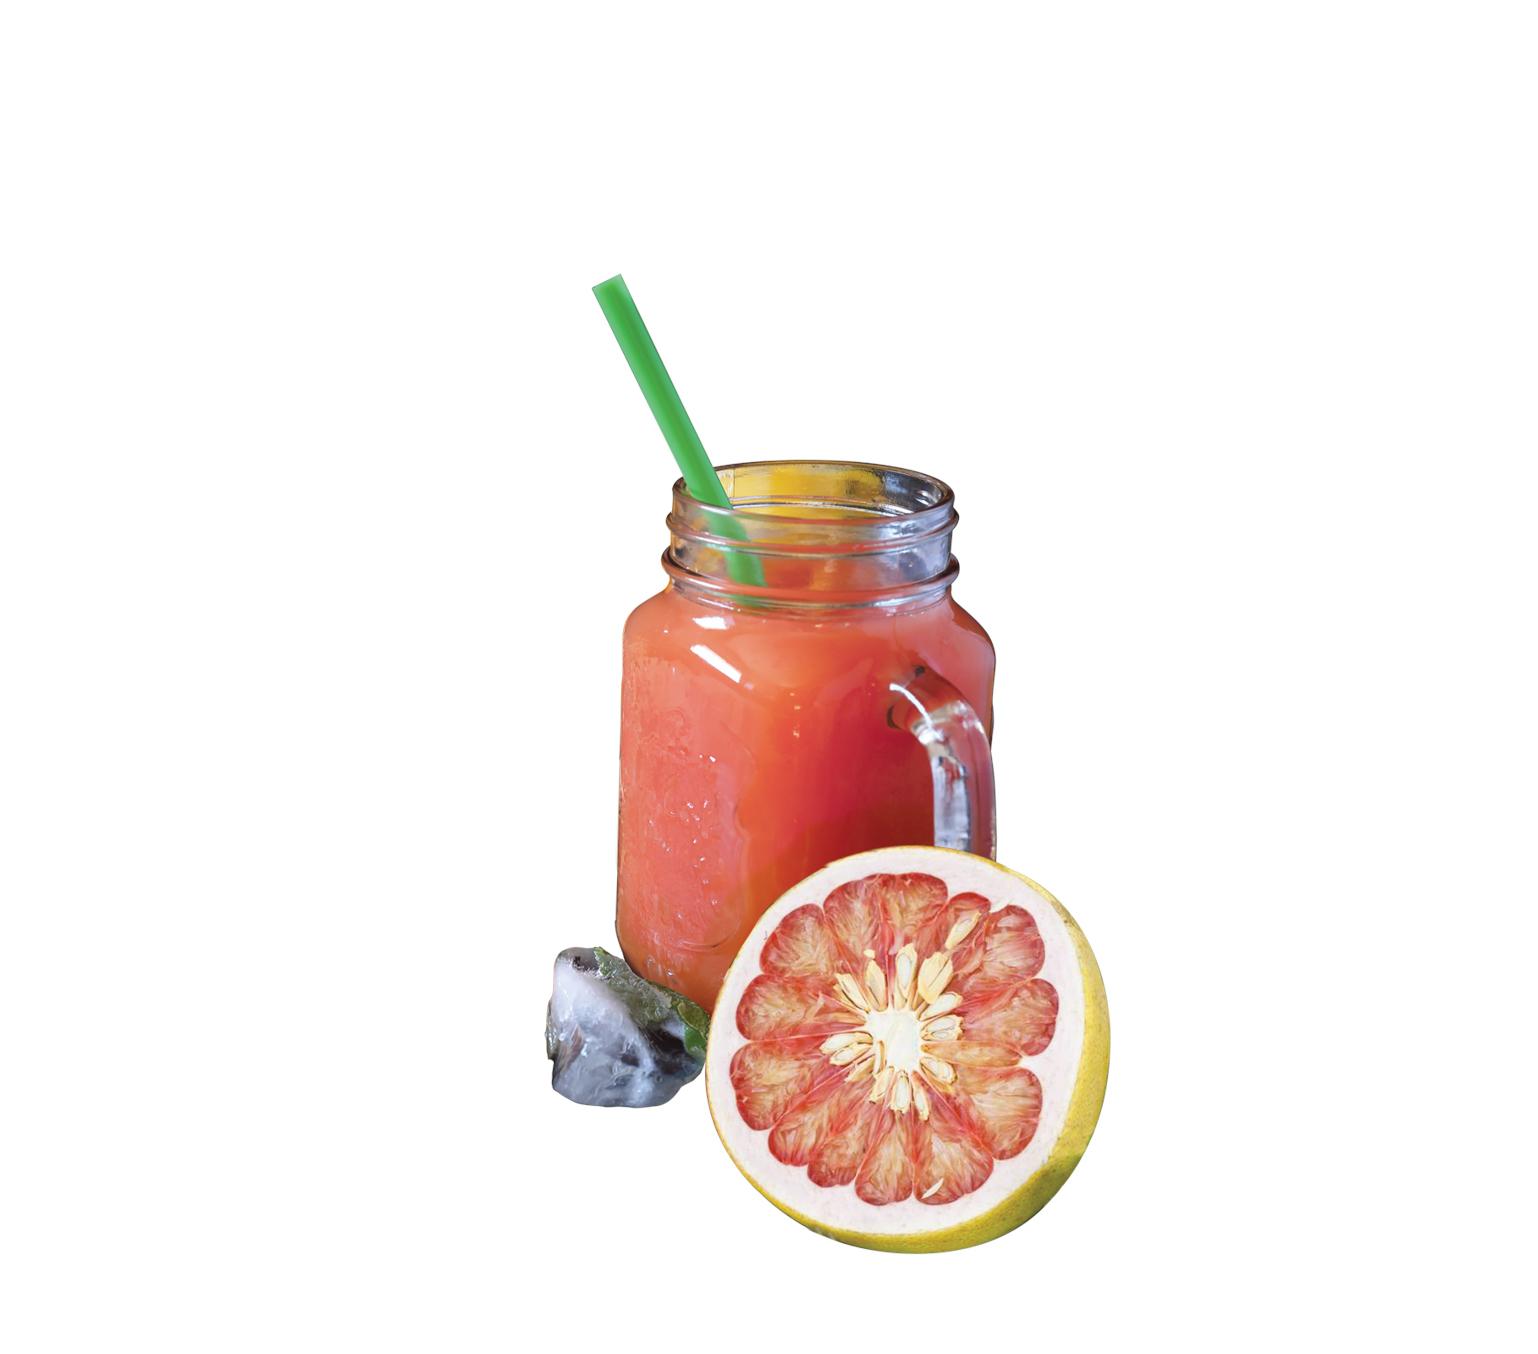 Virgin Fizzy Jambola Margarita